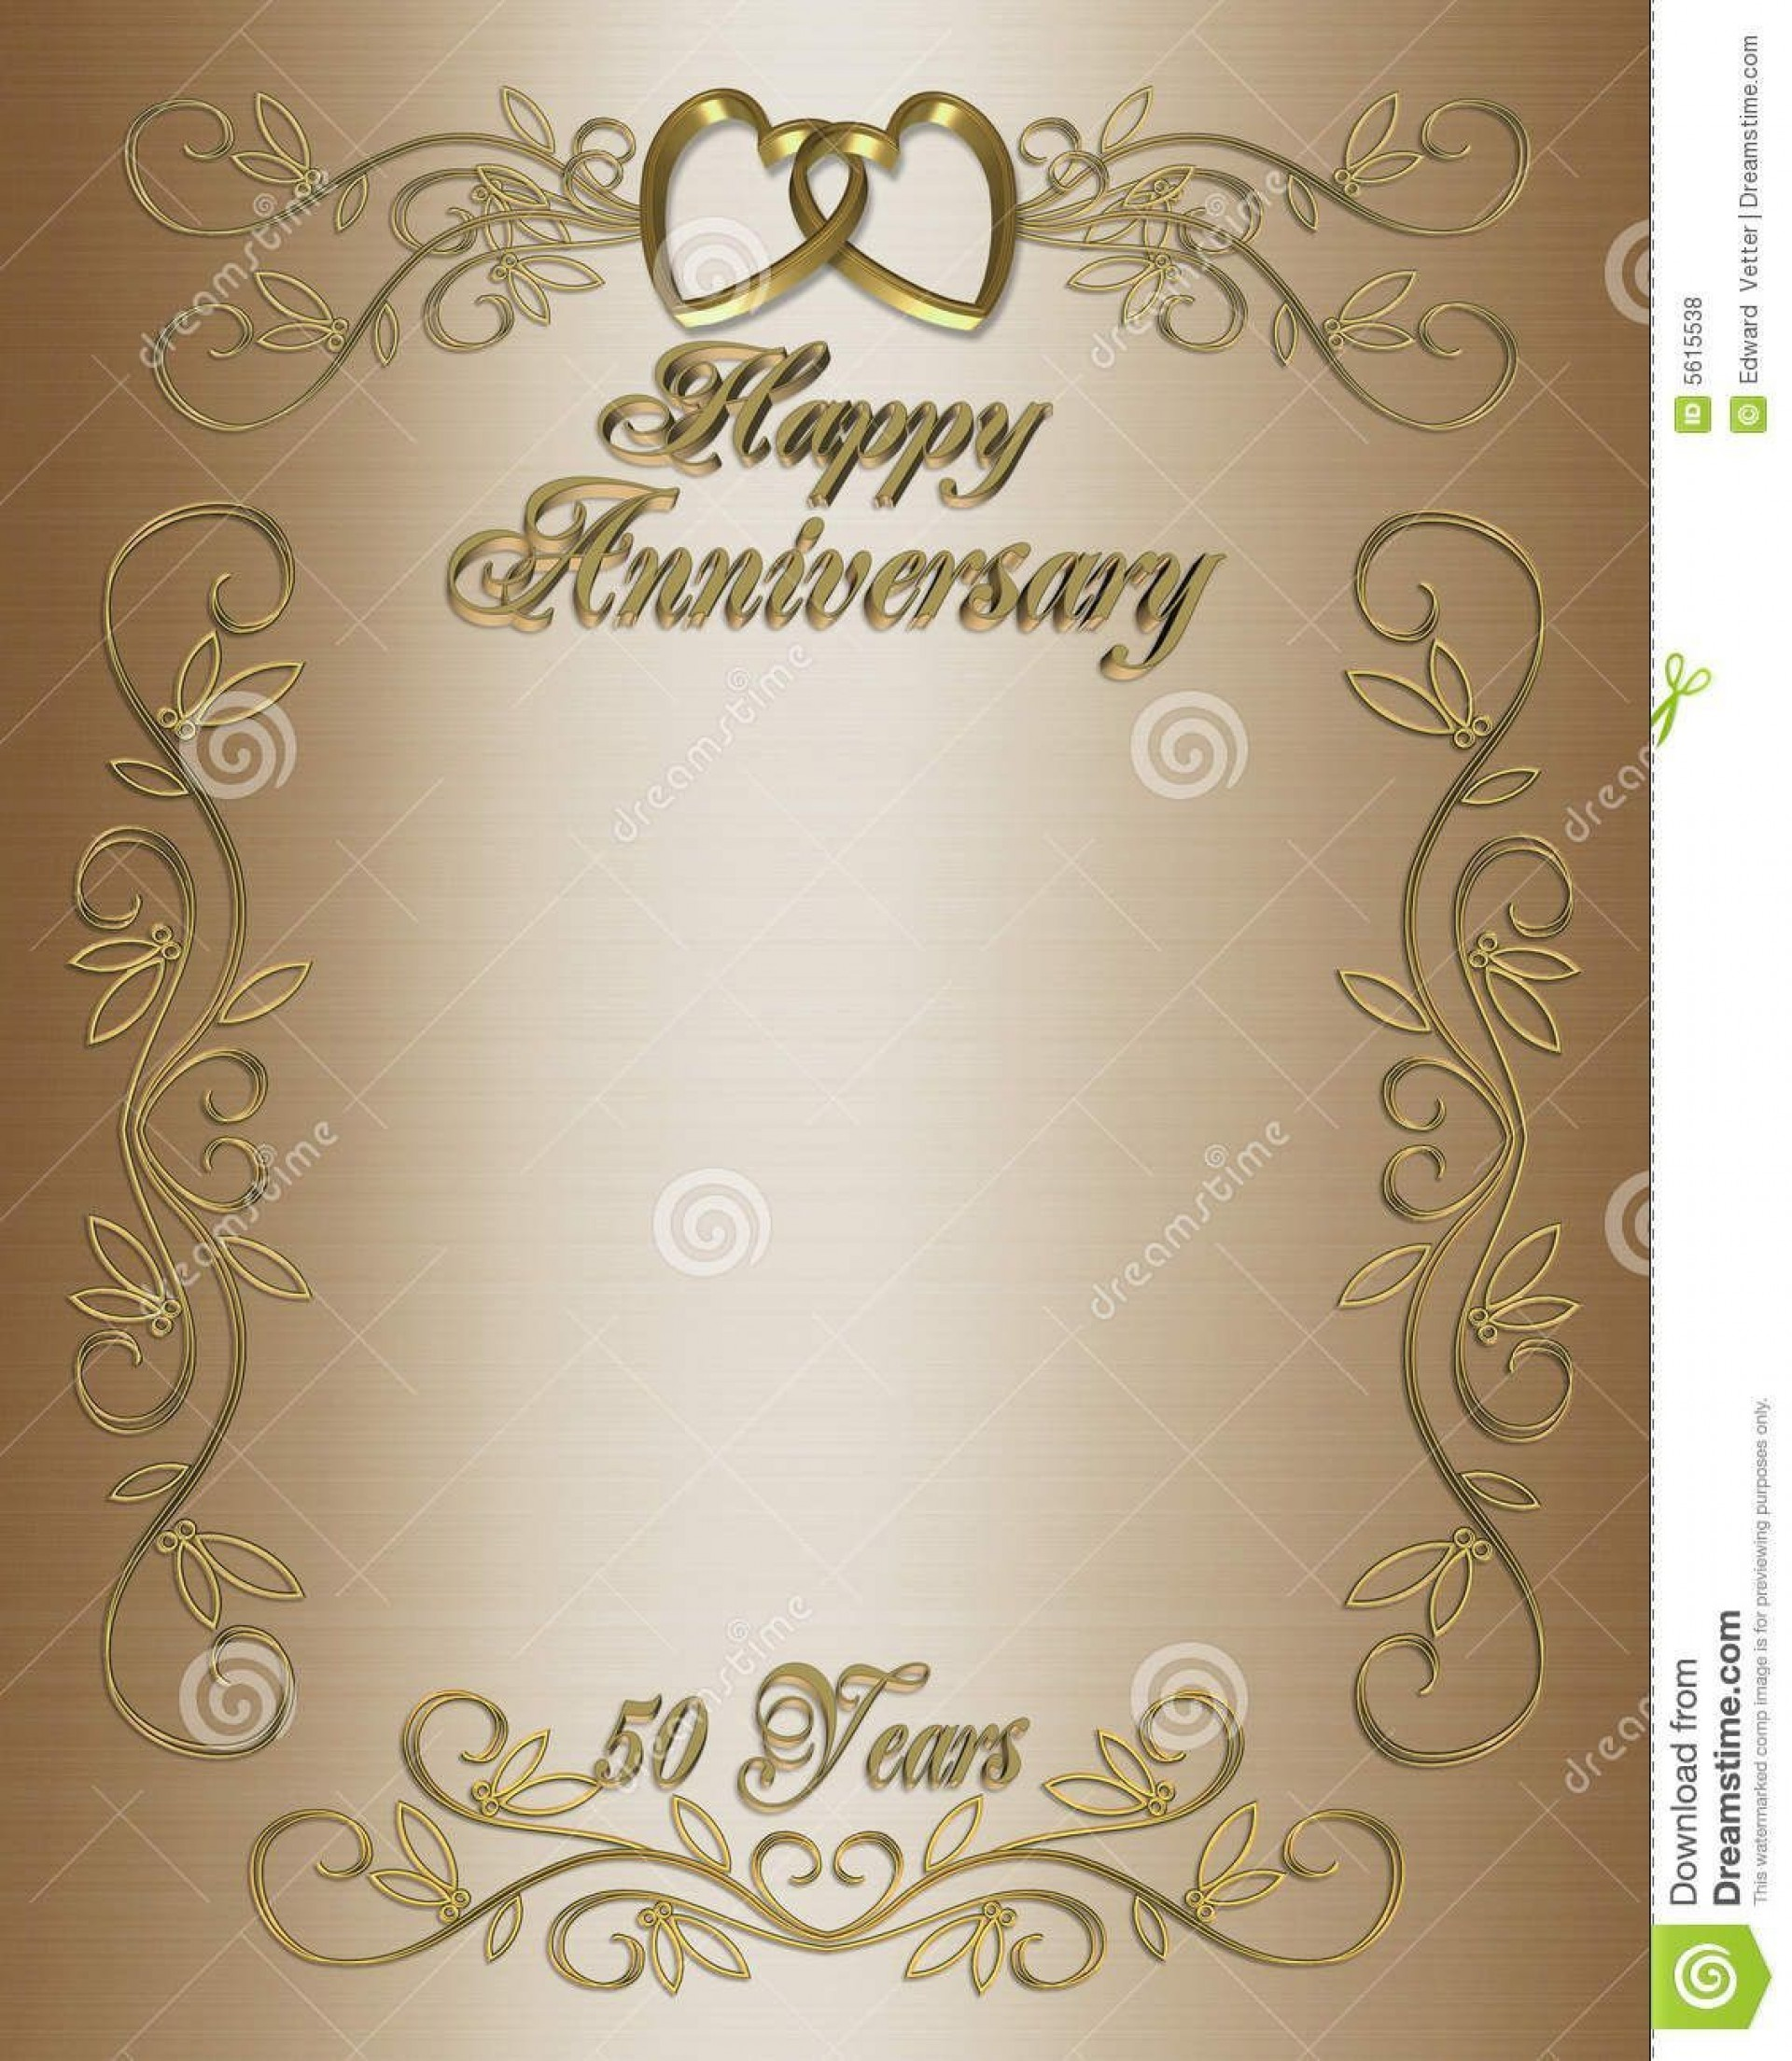 003 Striking 50th Anniversary Invitation Card Template Design  Templates Free1920